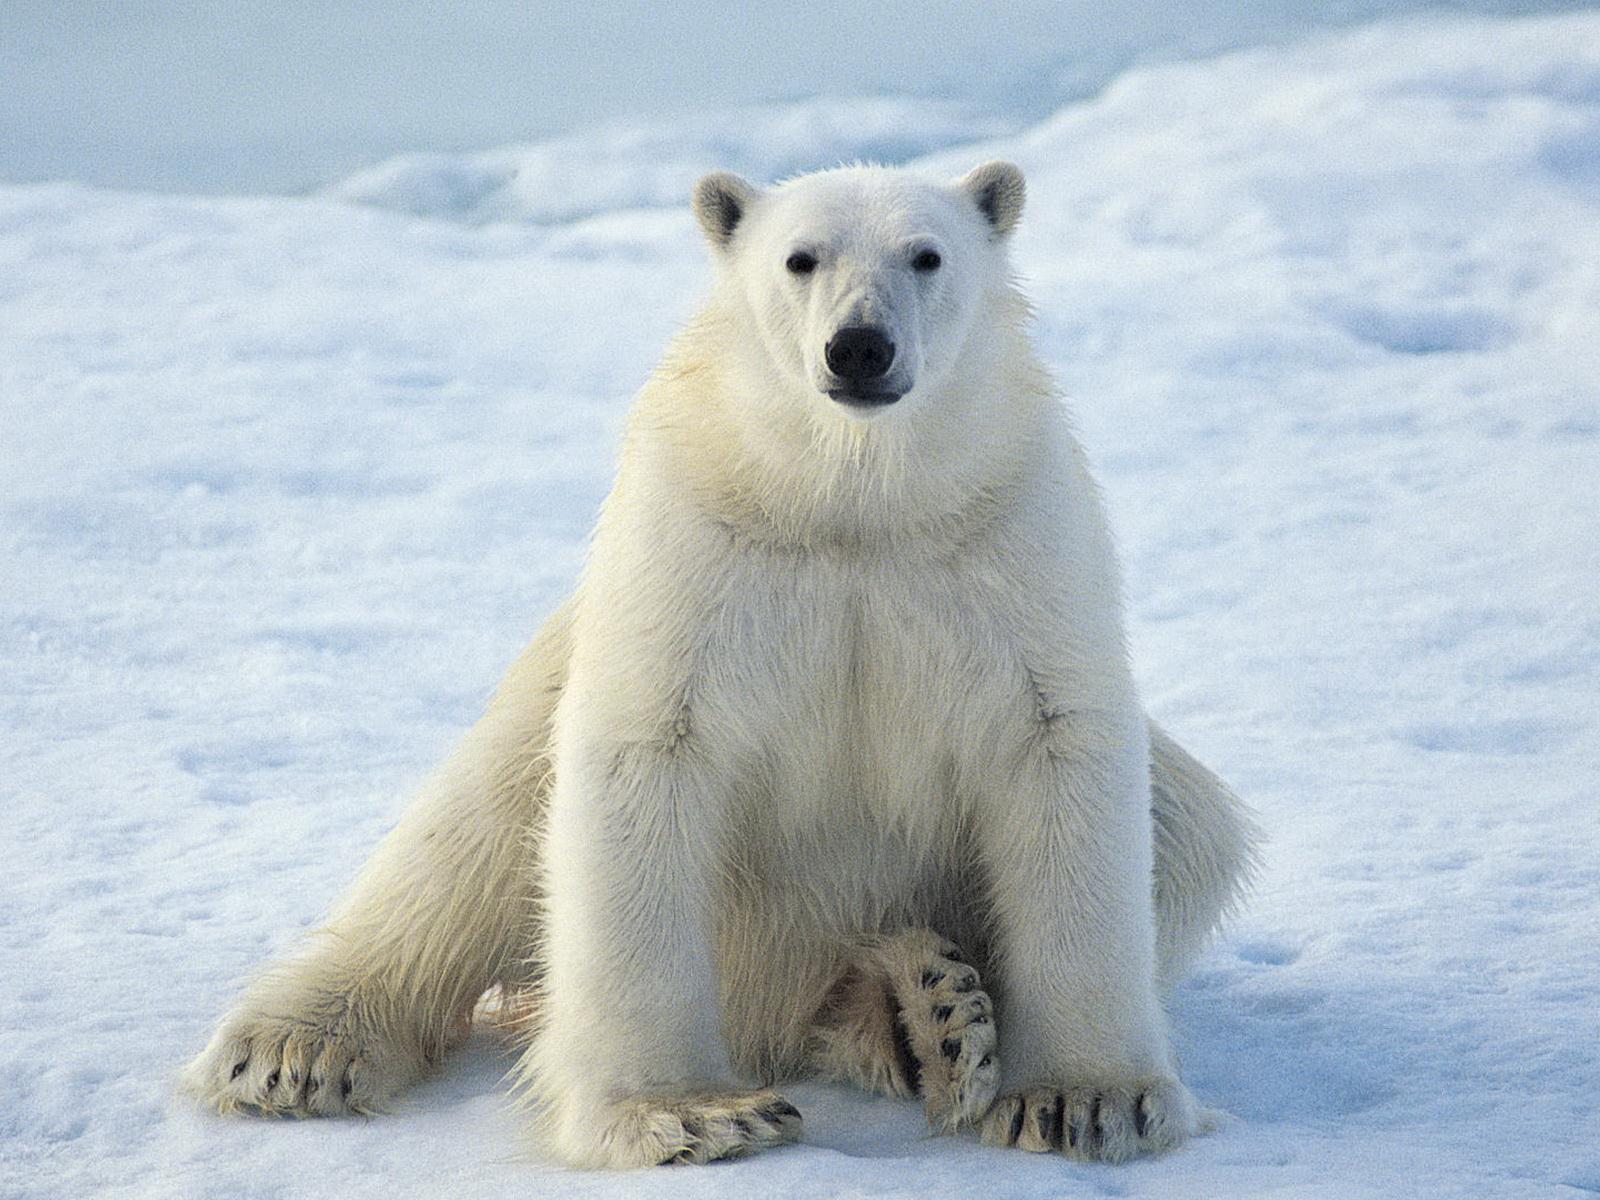 polar bear desktop wallpaper wallpapersafari. Black Bedroom Furniture Sets. Home Design Ideas